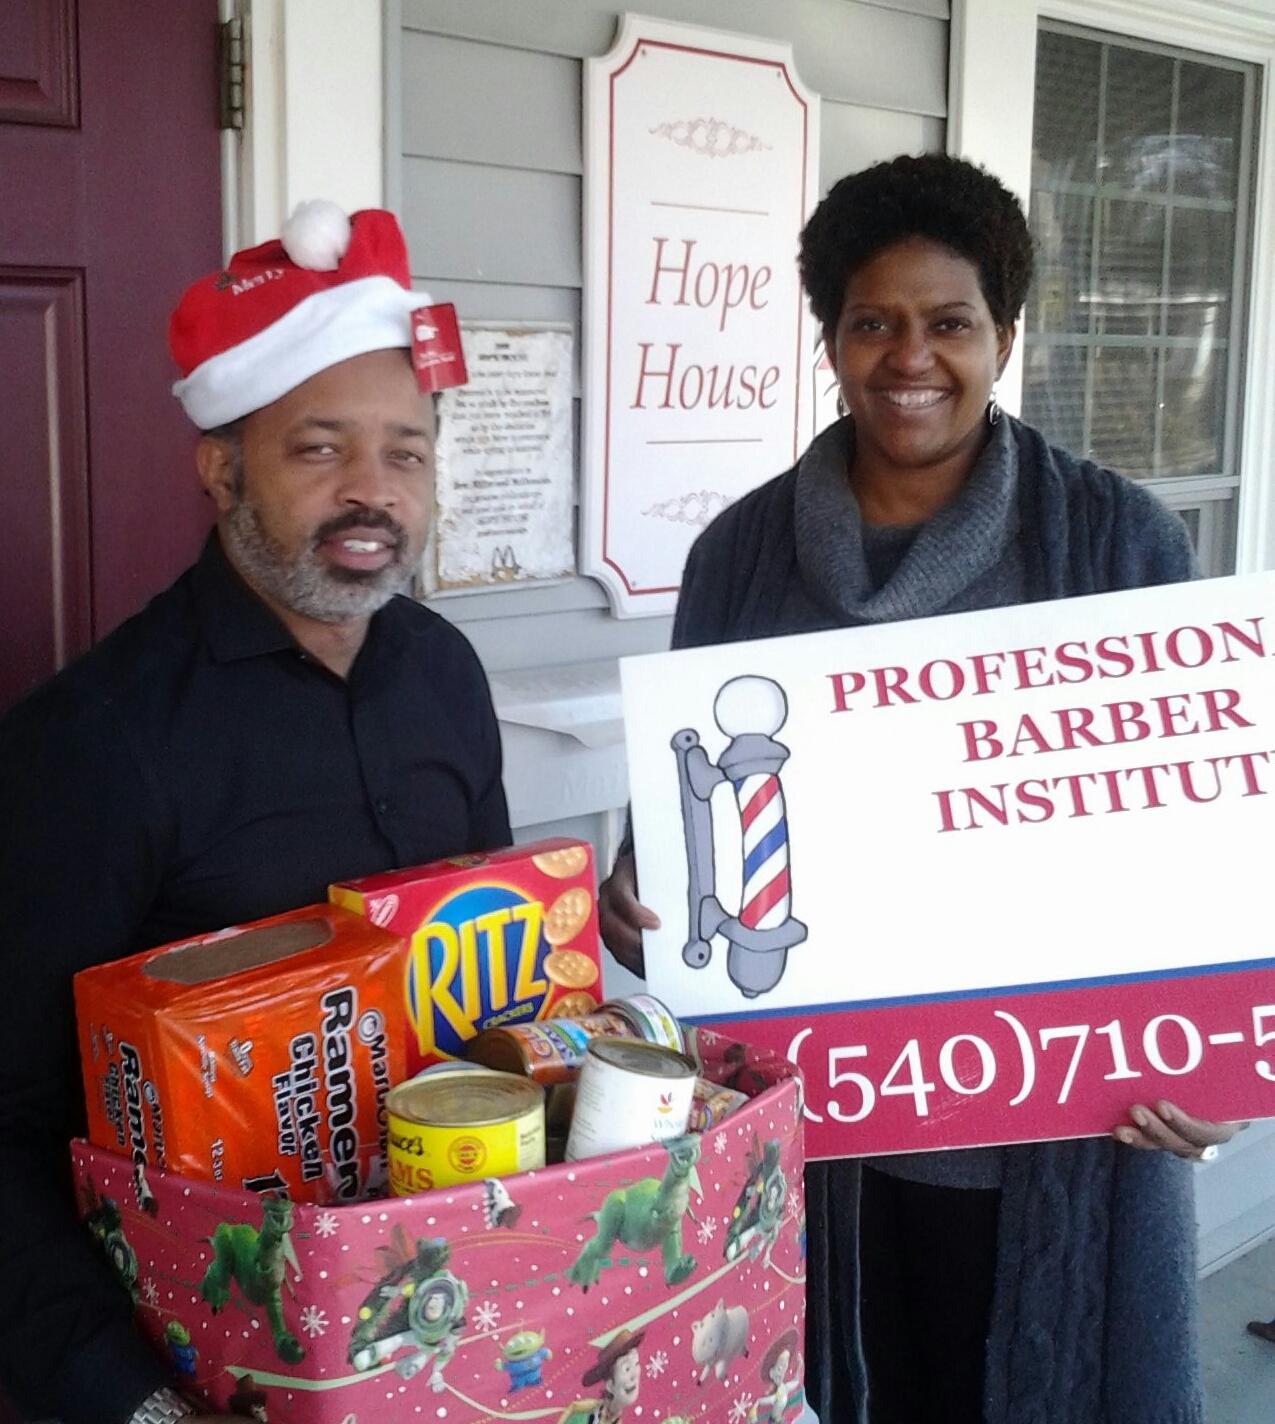 Barber Institute Contributions